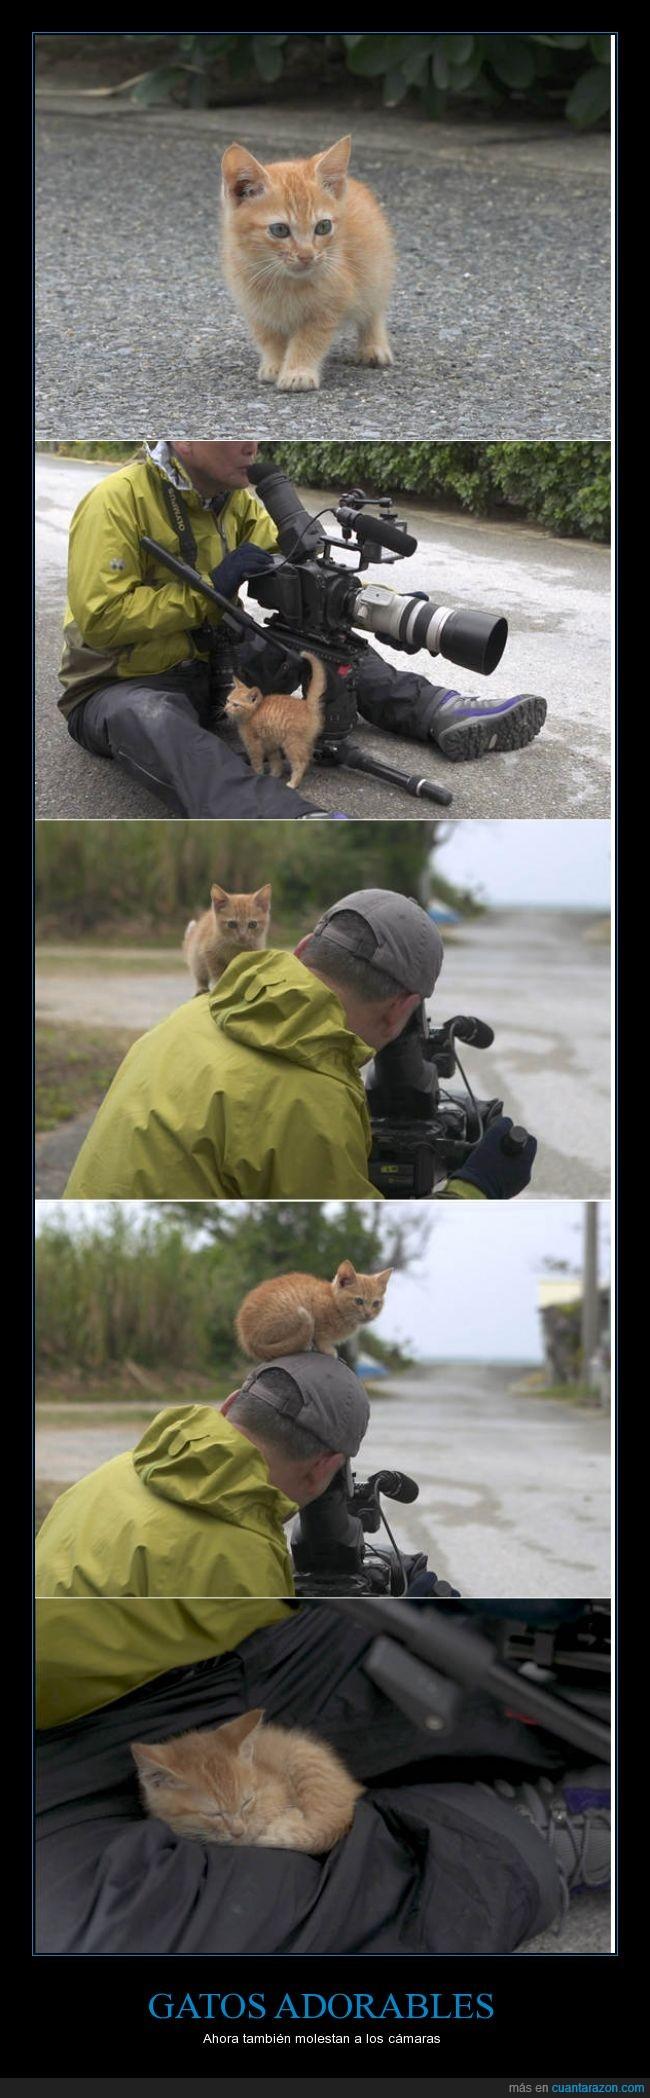 adorable,camara,camarografo,cute,gato,lindo,molesto